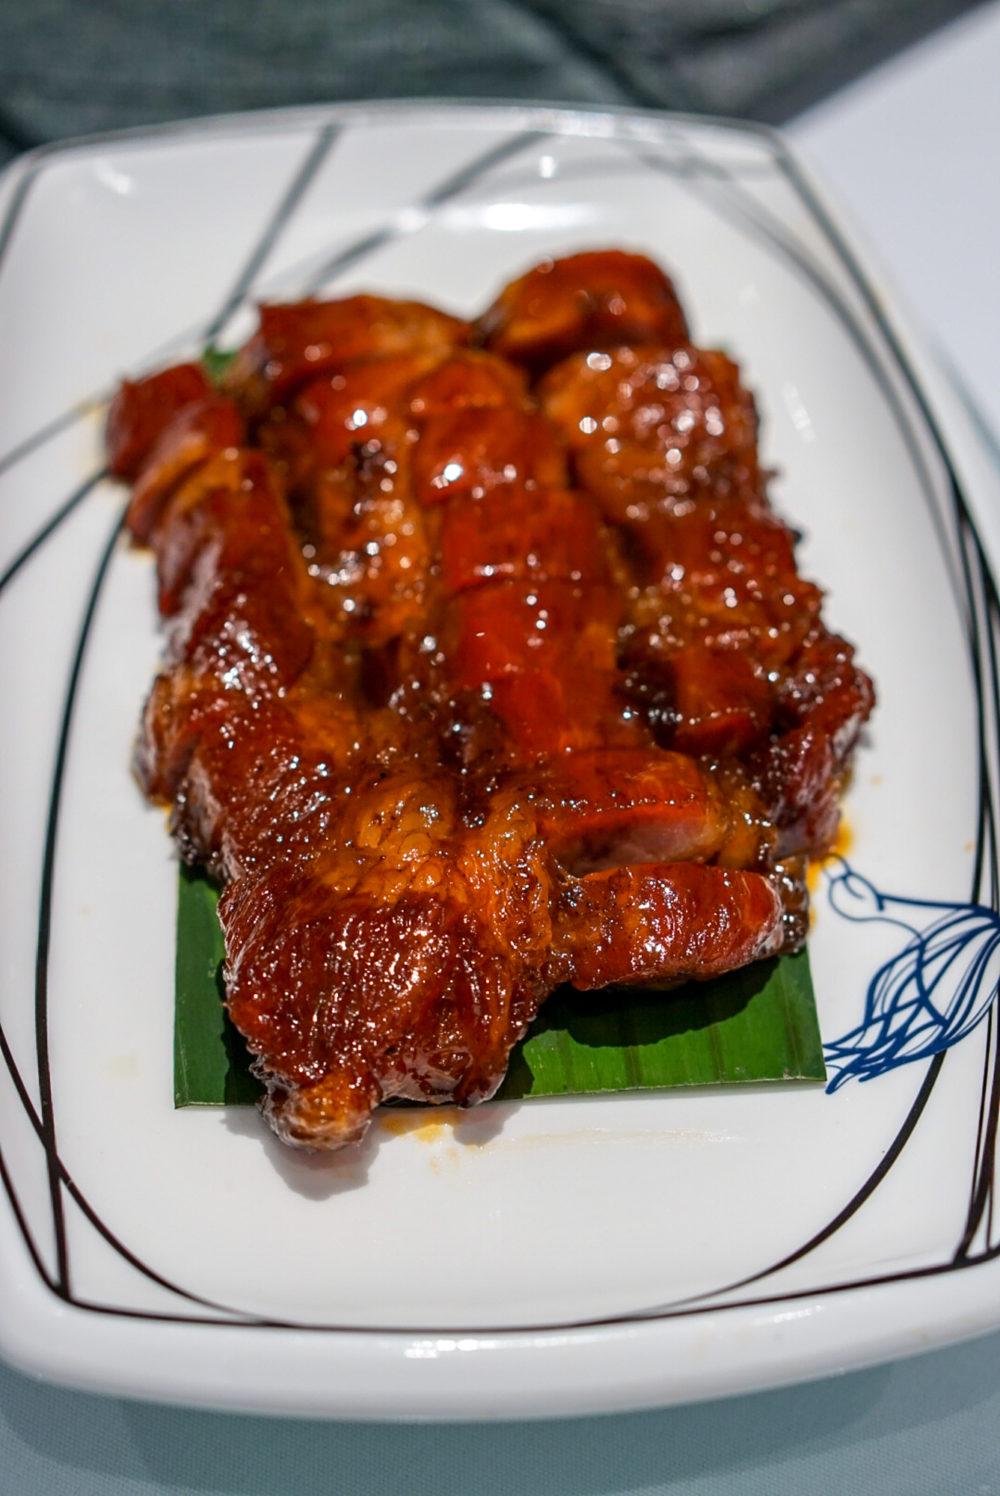 Forbidden Duck Singapore by Demon Chef Alvin Leung - Iberico Pork Char Siu